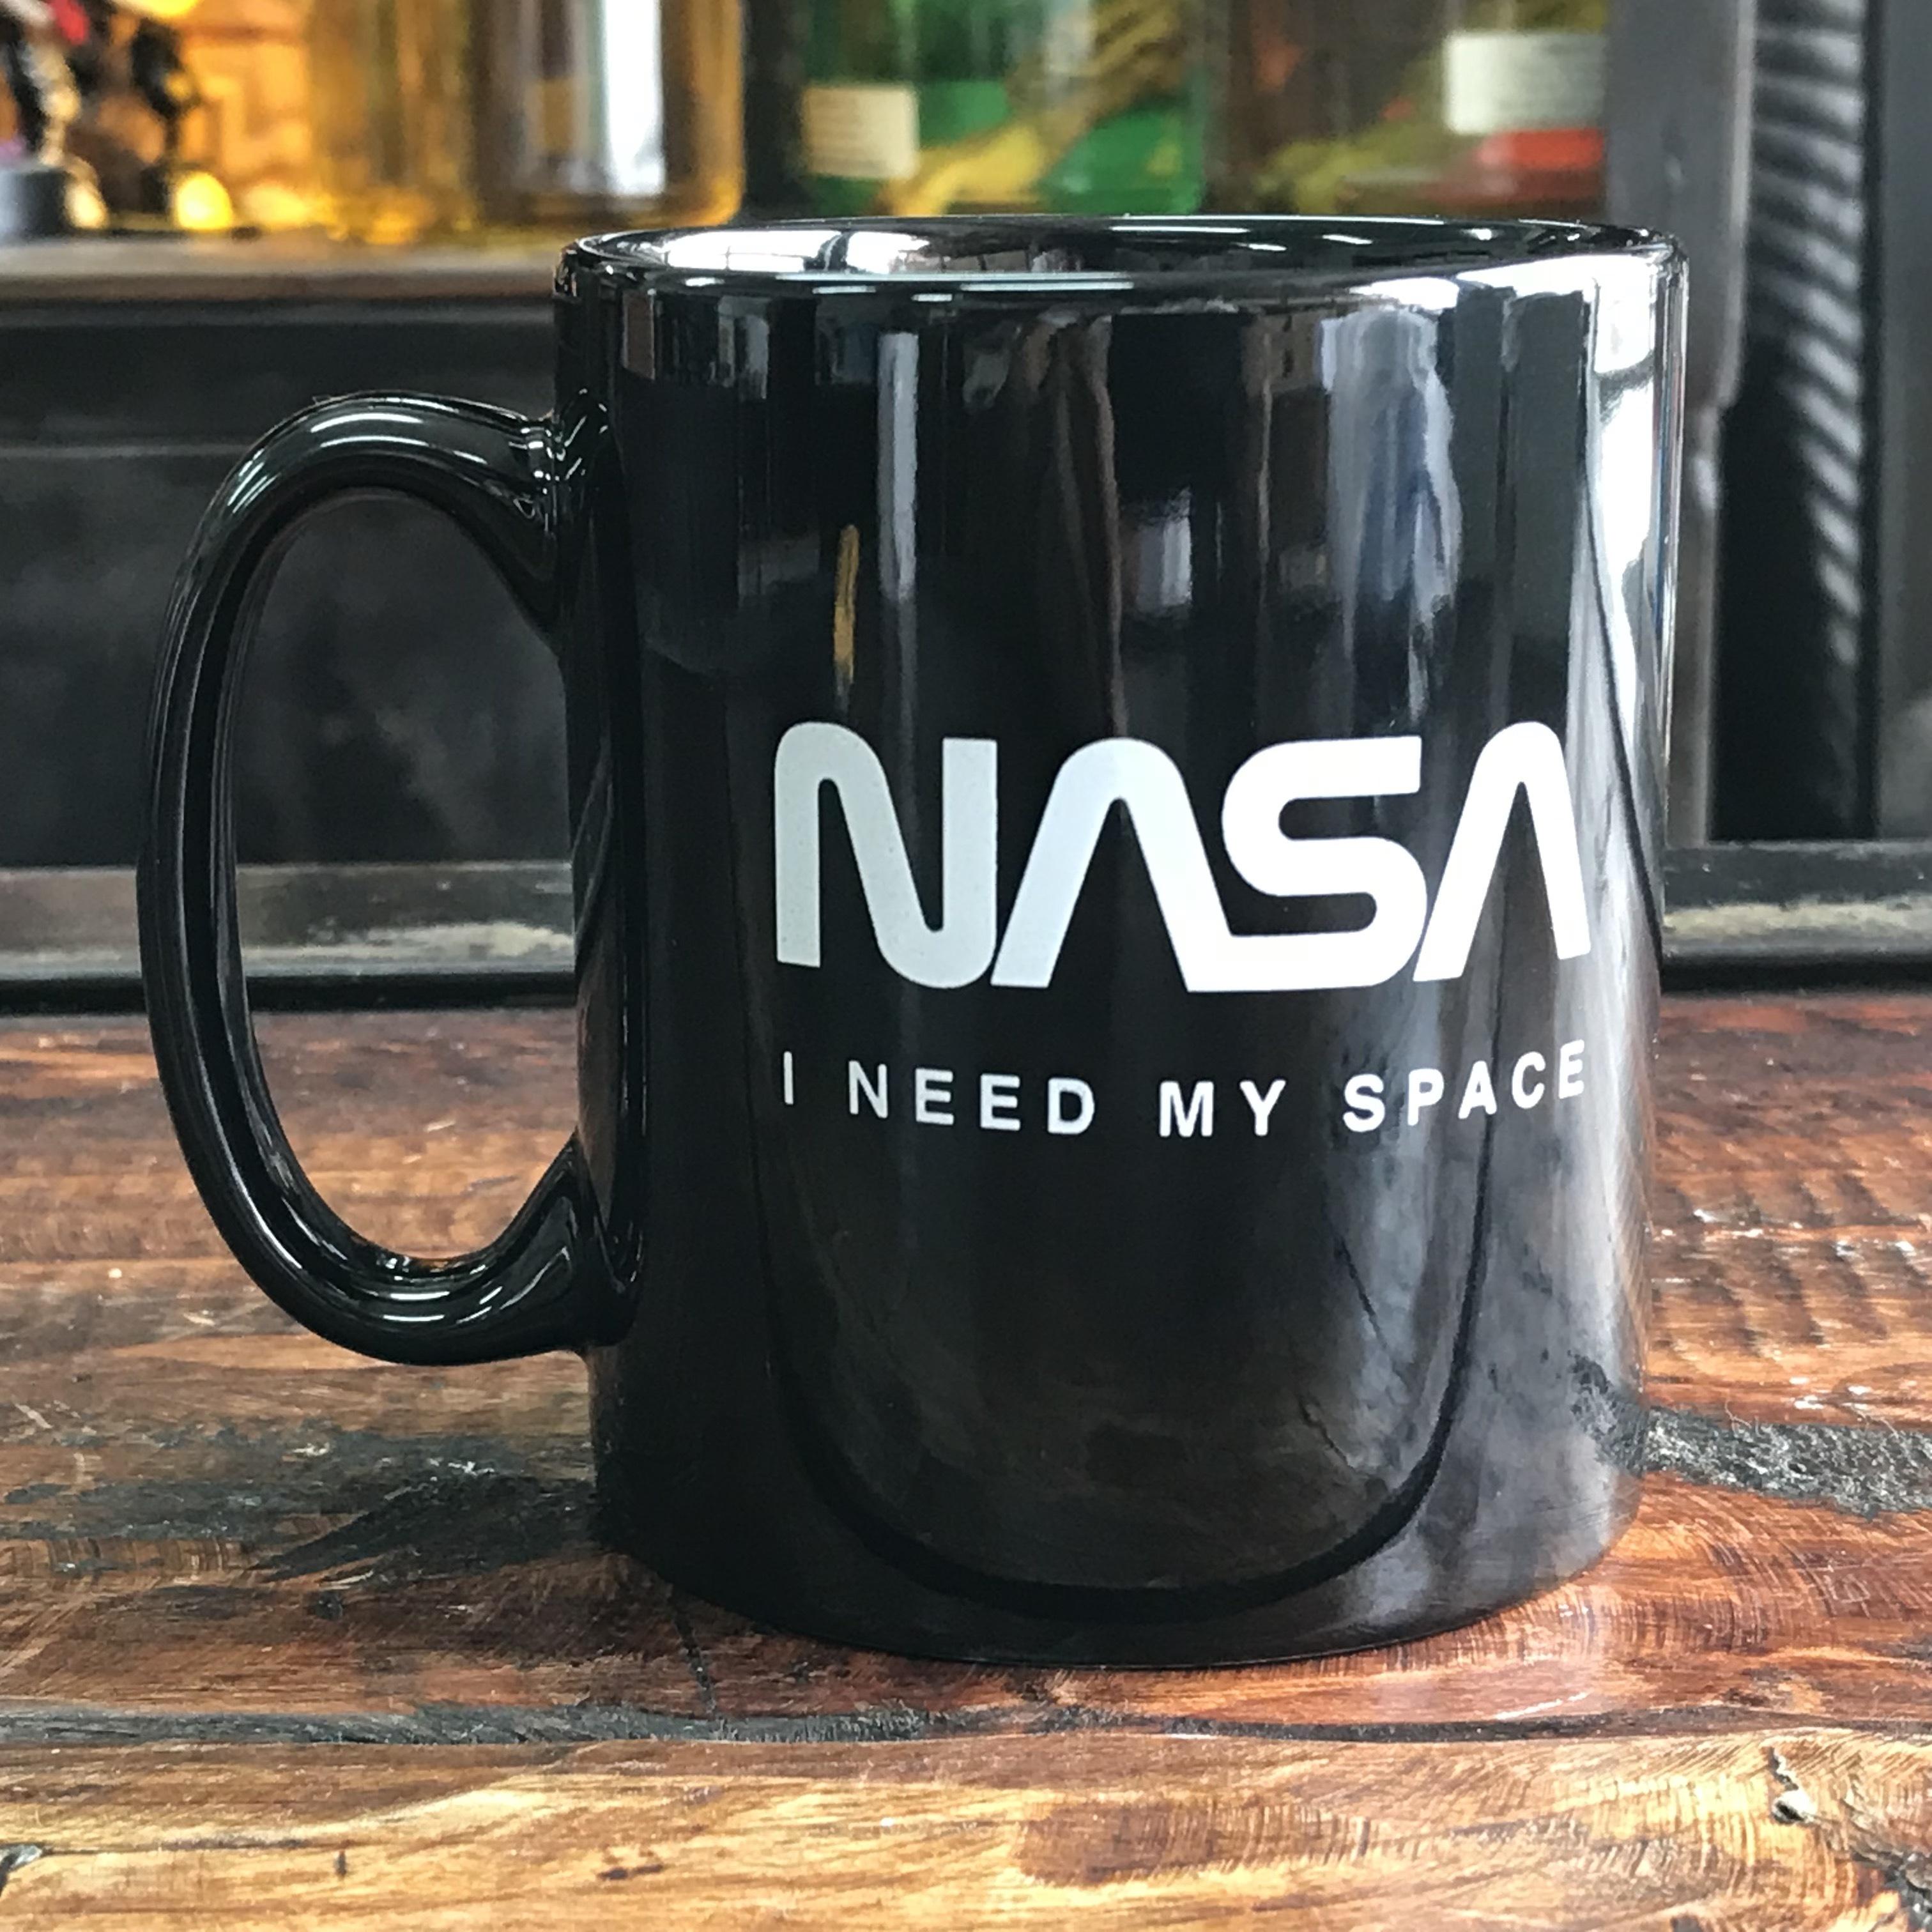 NASA公認(アメリカ航空宇宙局)マグカップ・ロゴタイプ(ワーム)